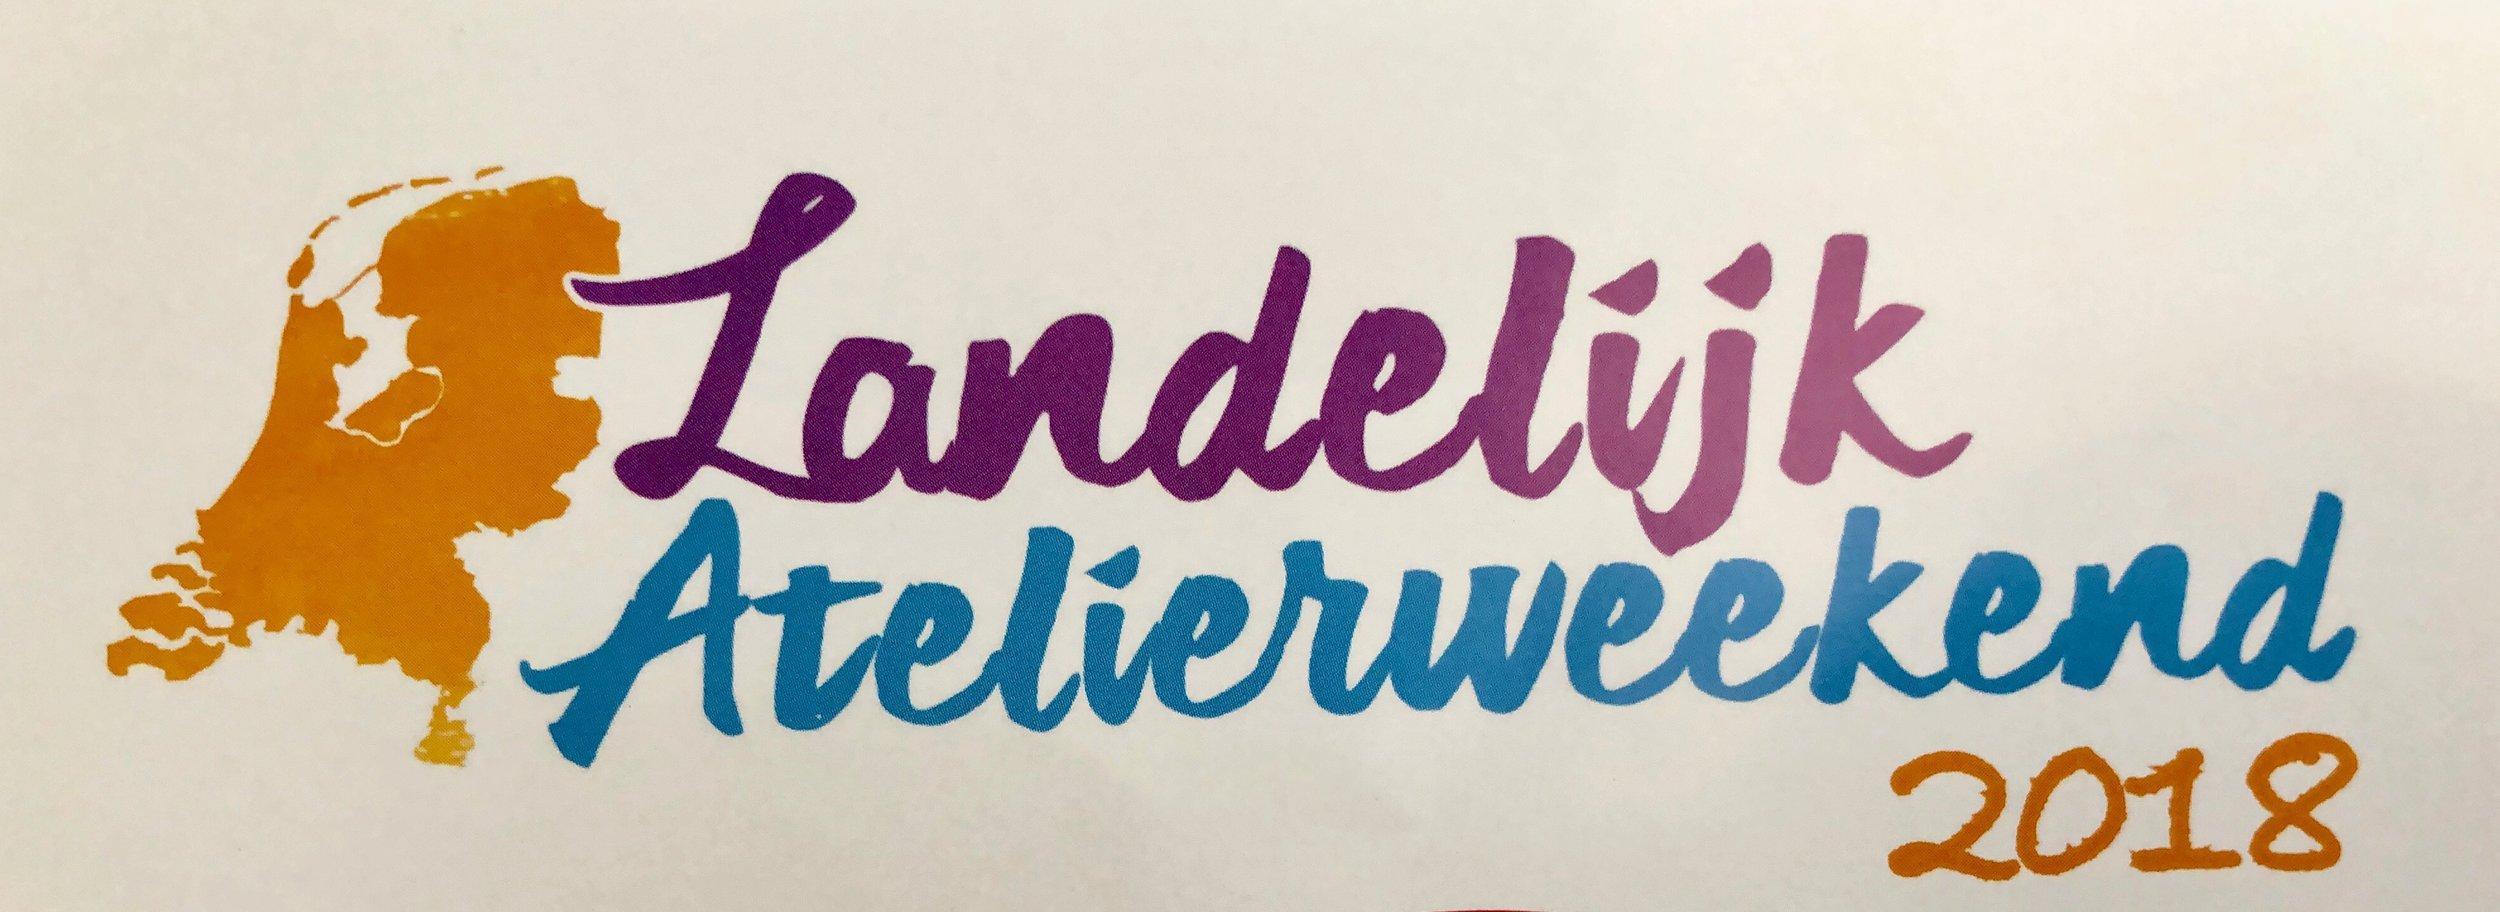 The Dutch National Studio weekend 2018.